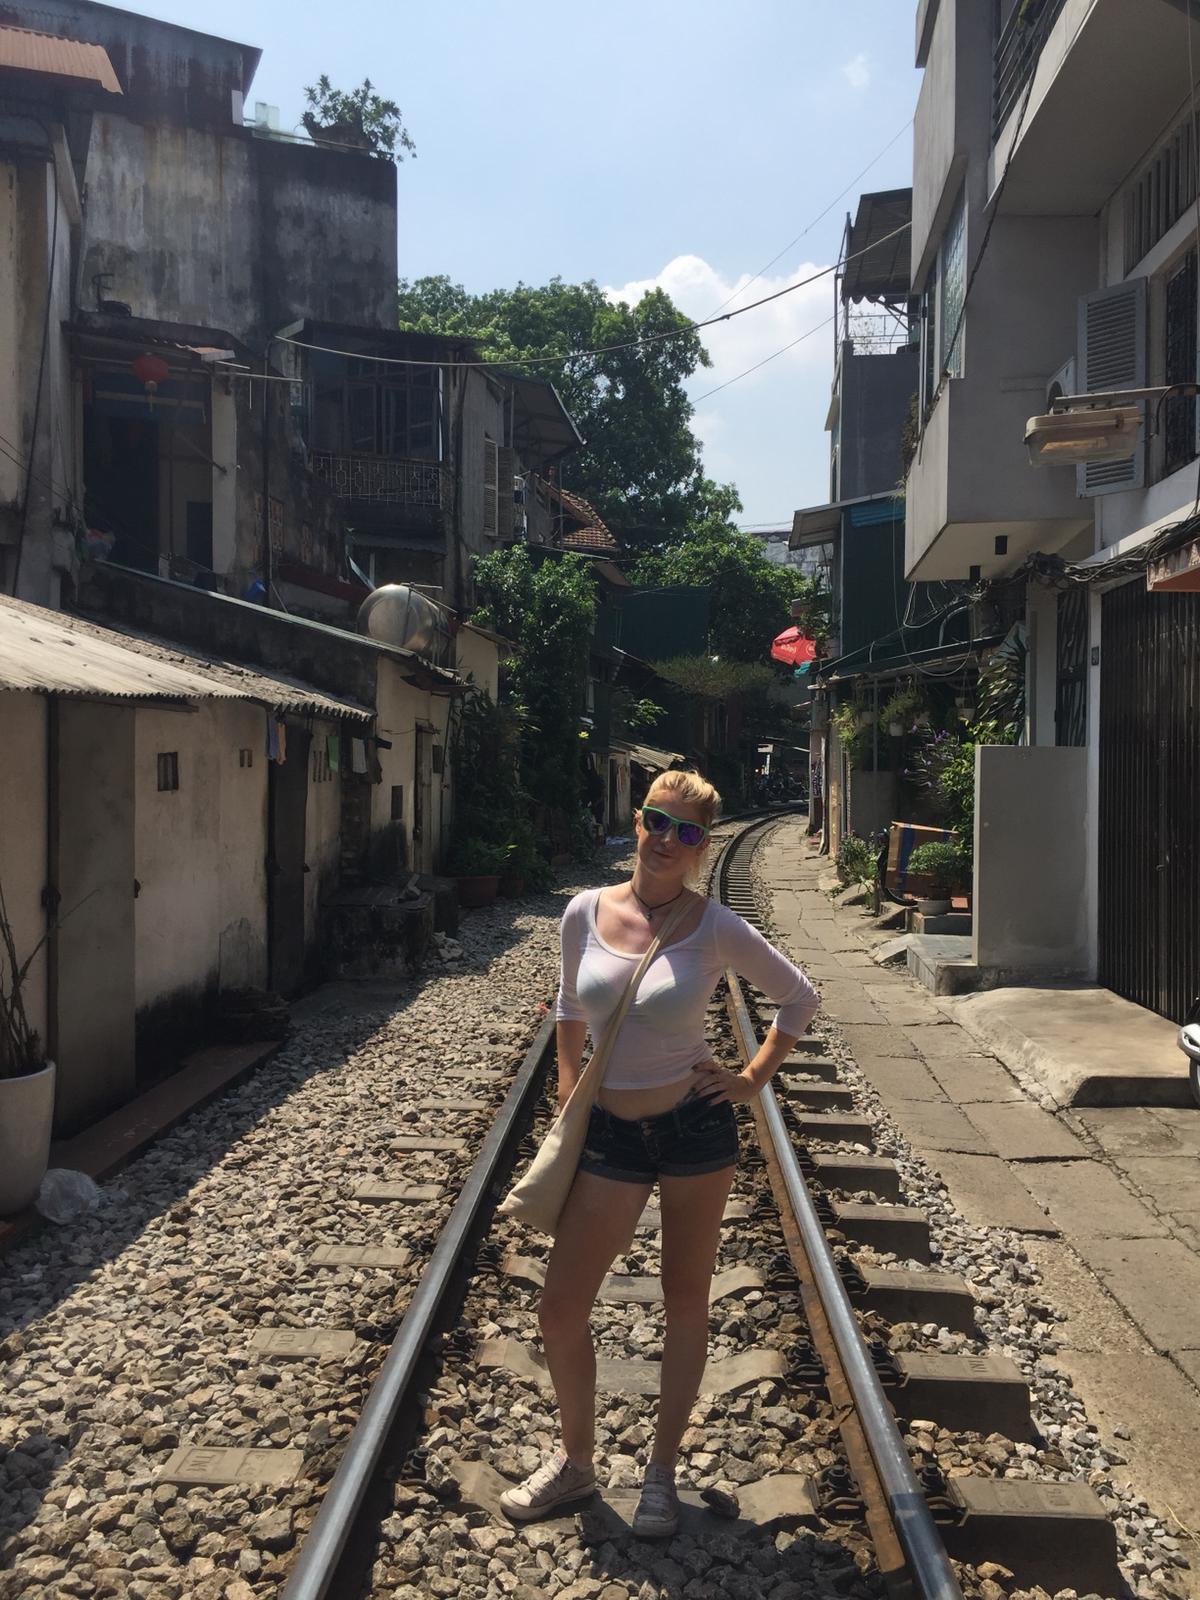 The train track shot in Hanoi